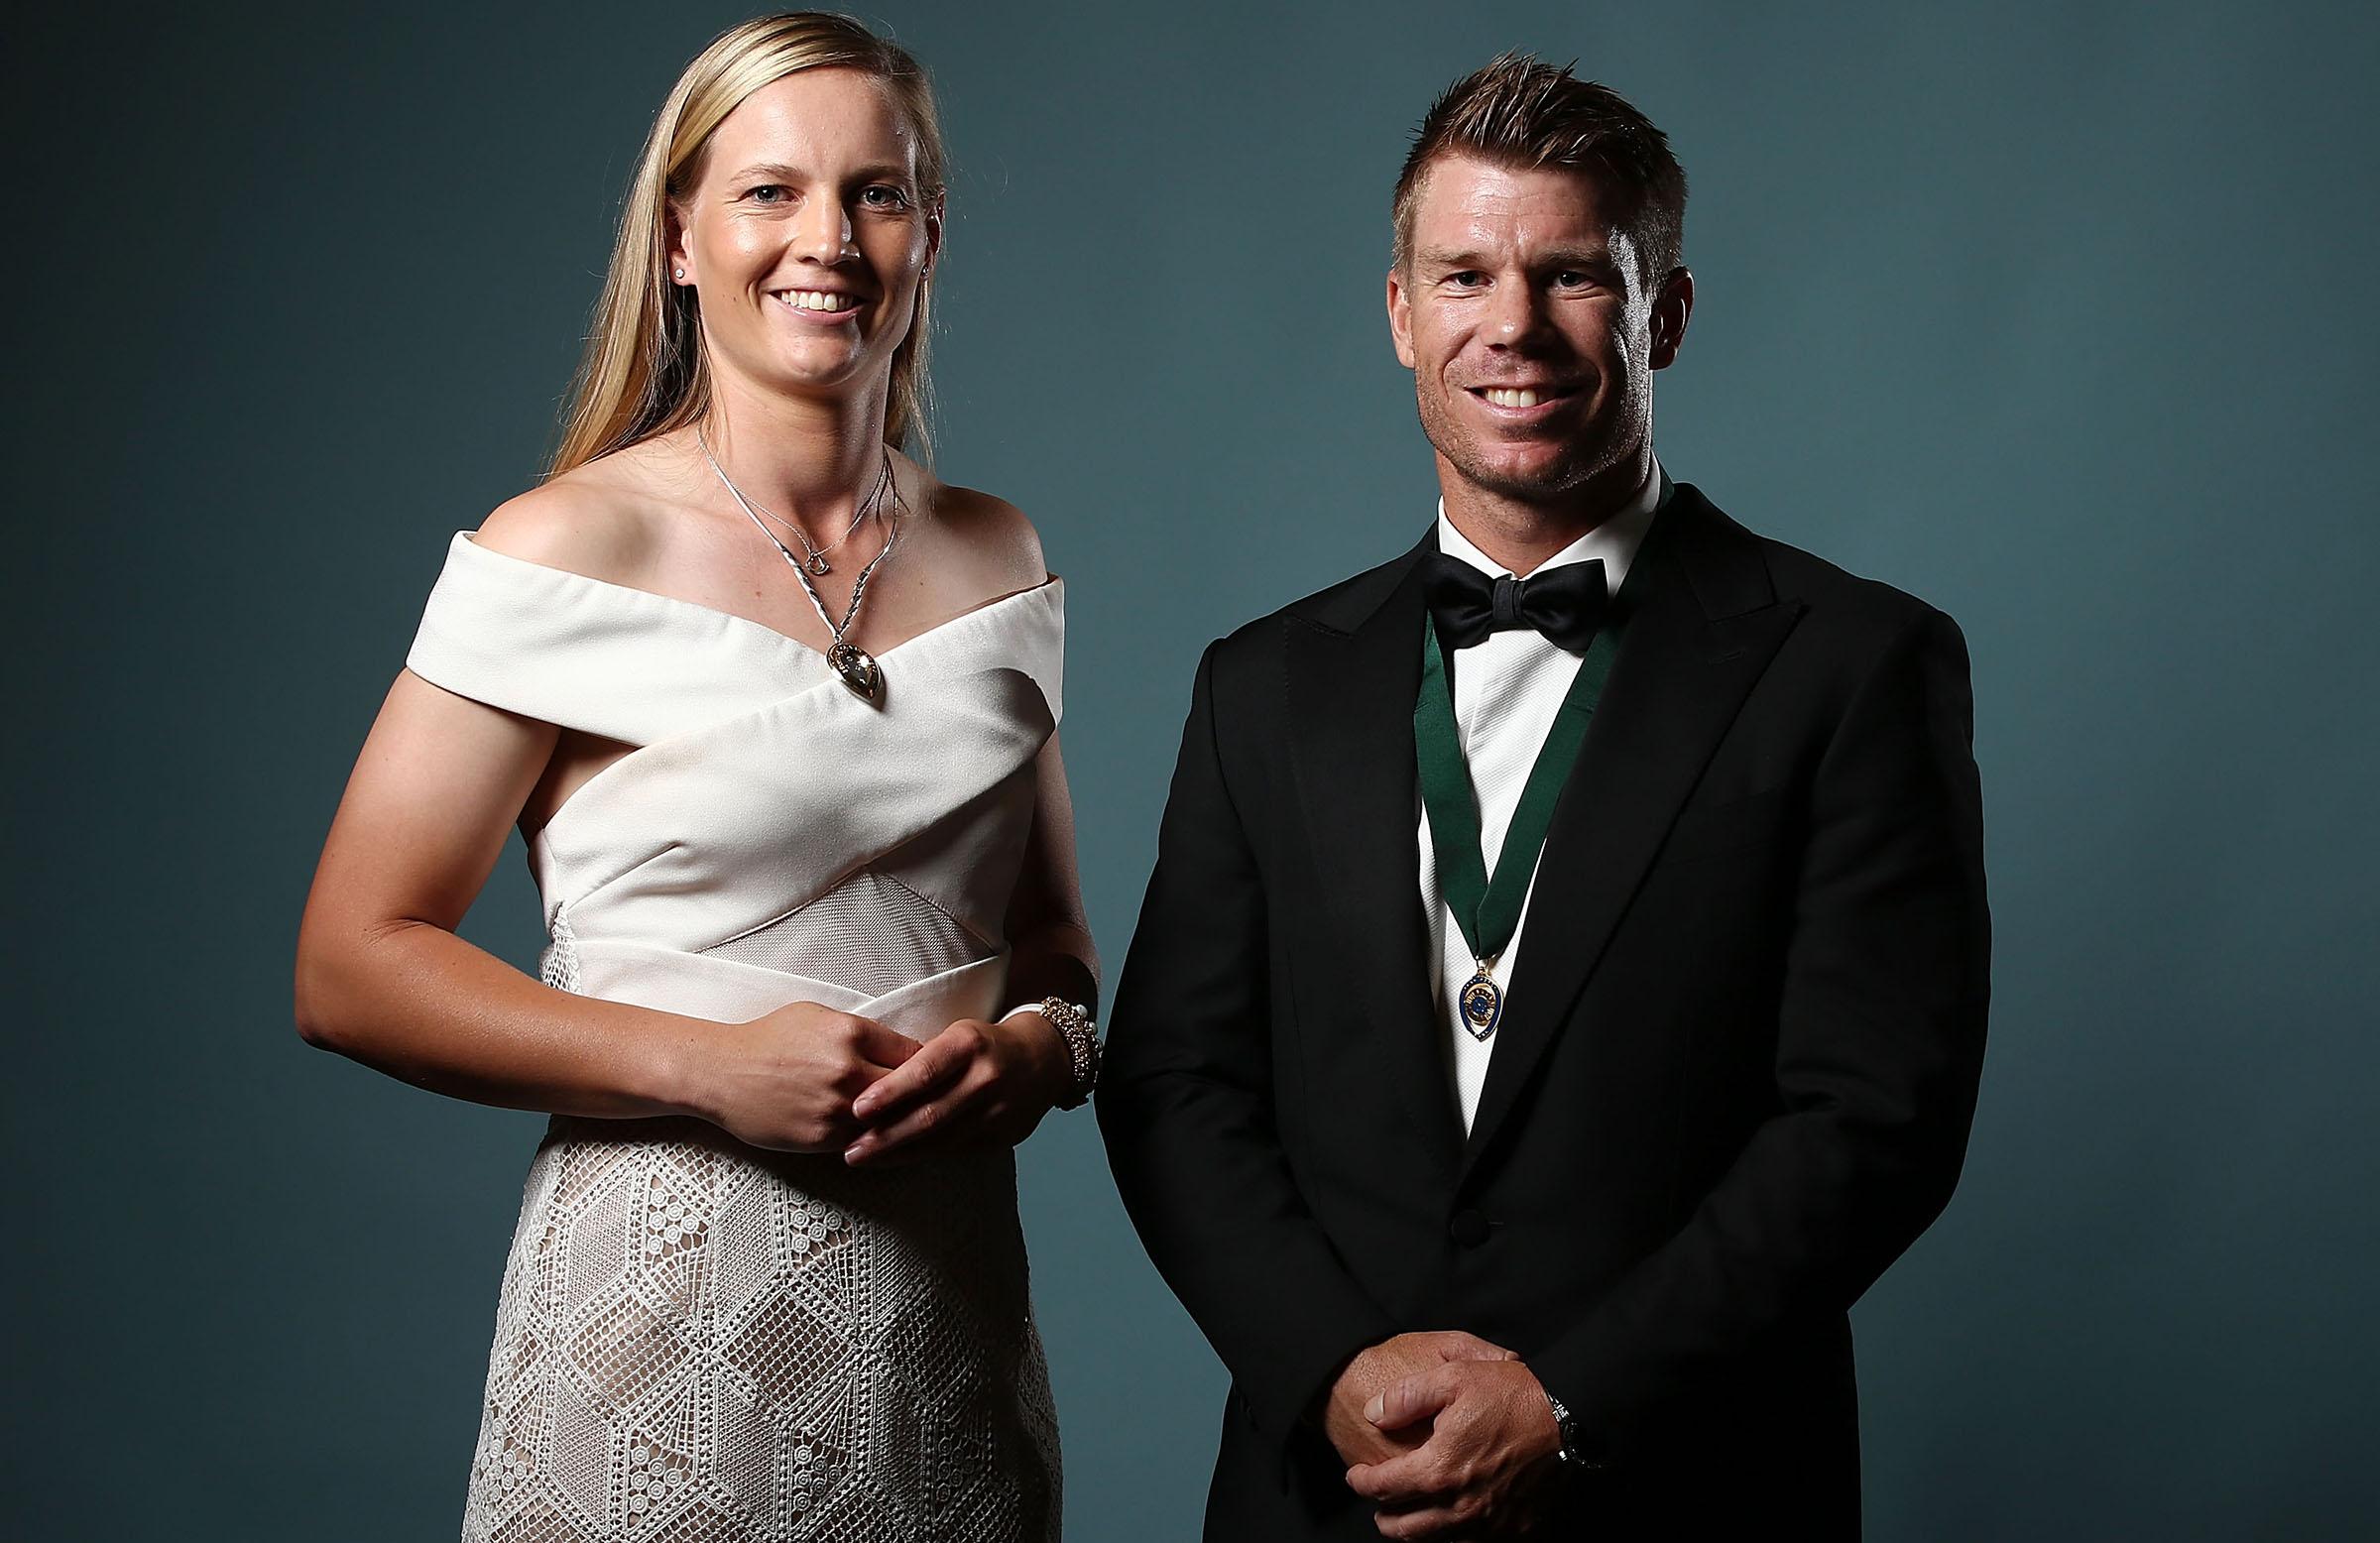 Meg Lanning and David Warner, the major winners in 2017 // Getty